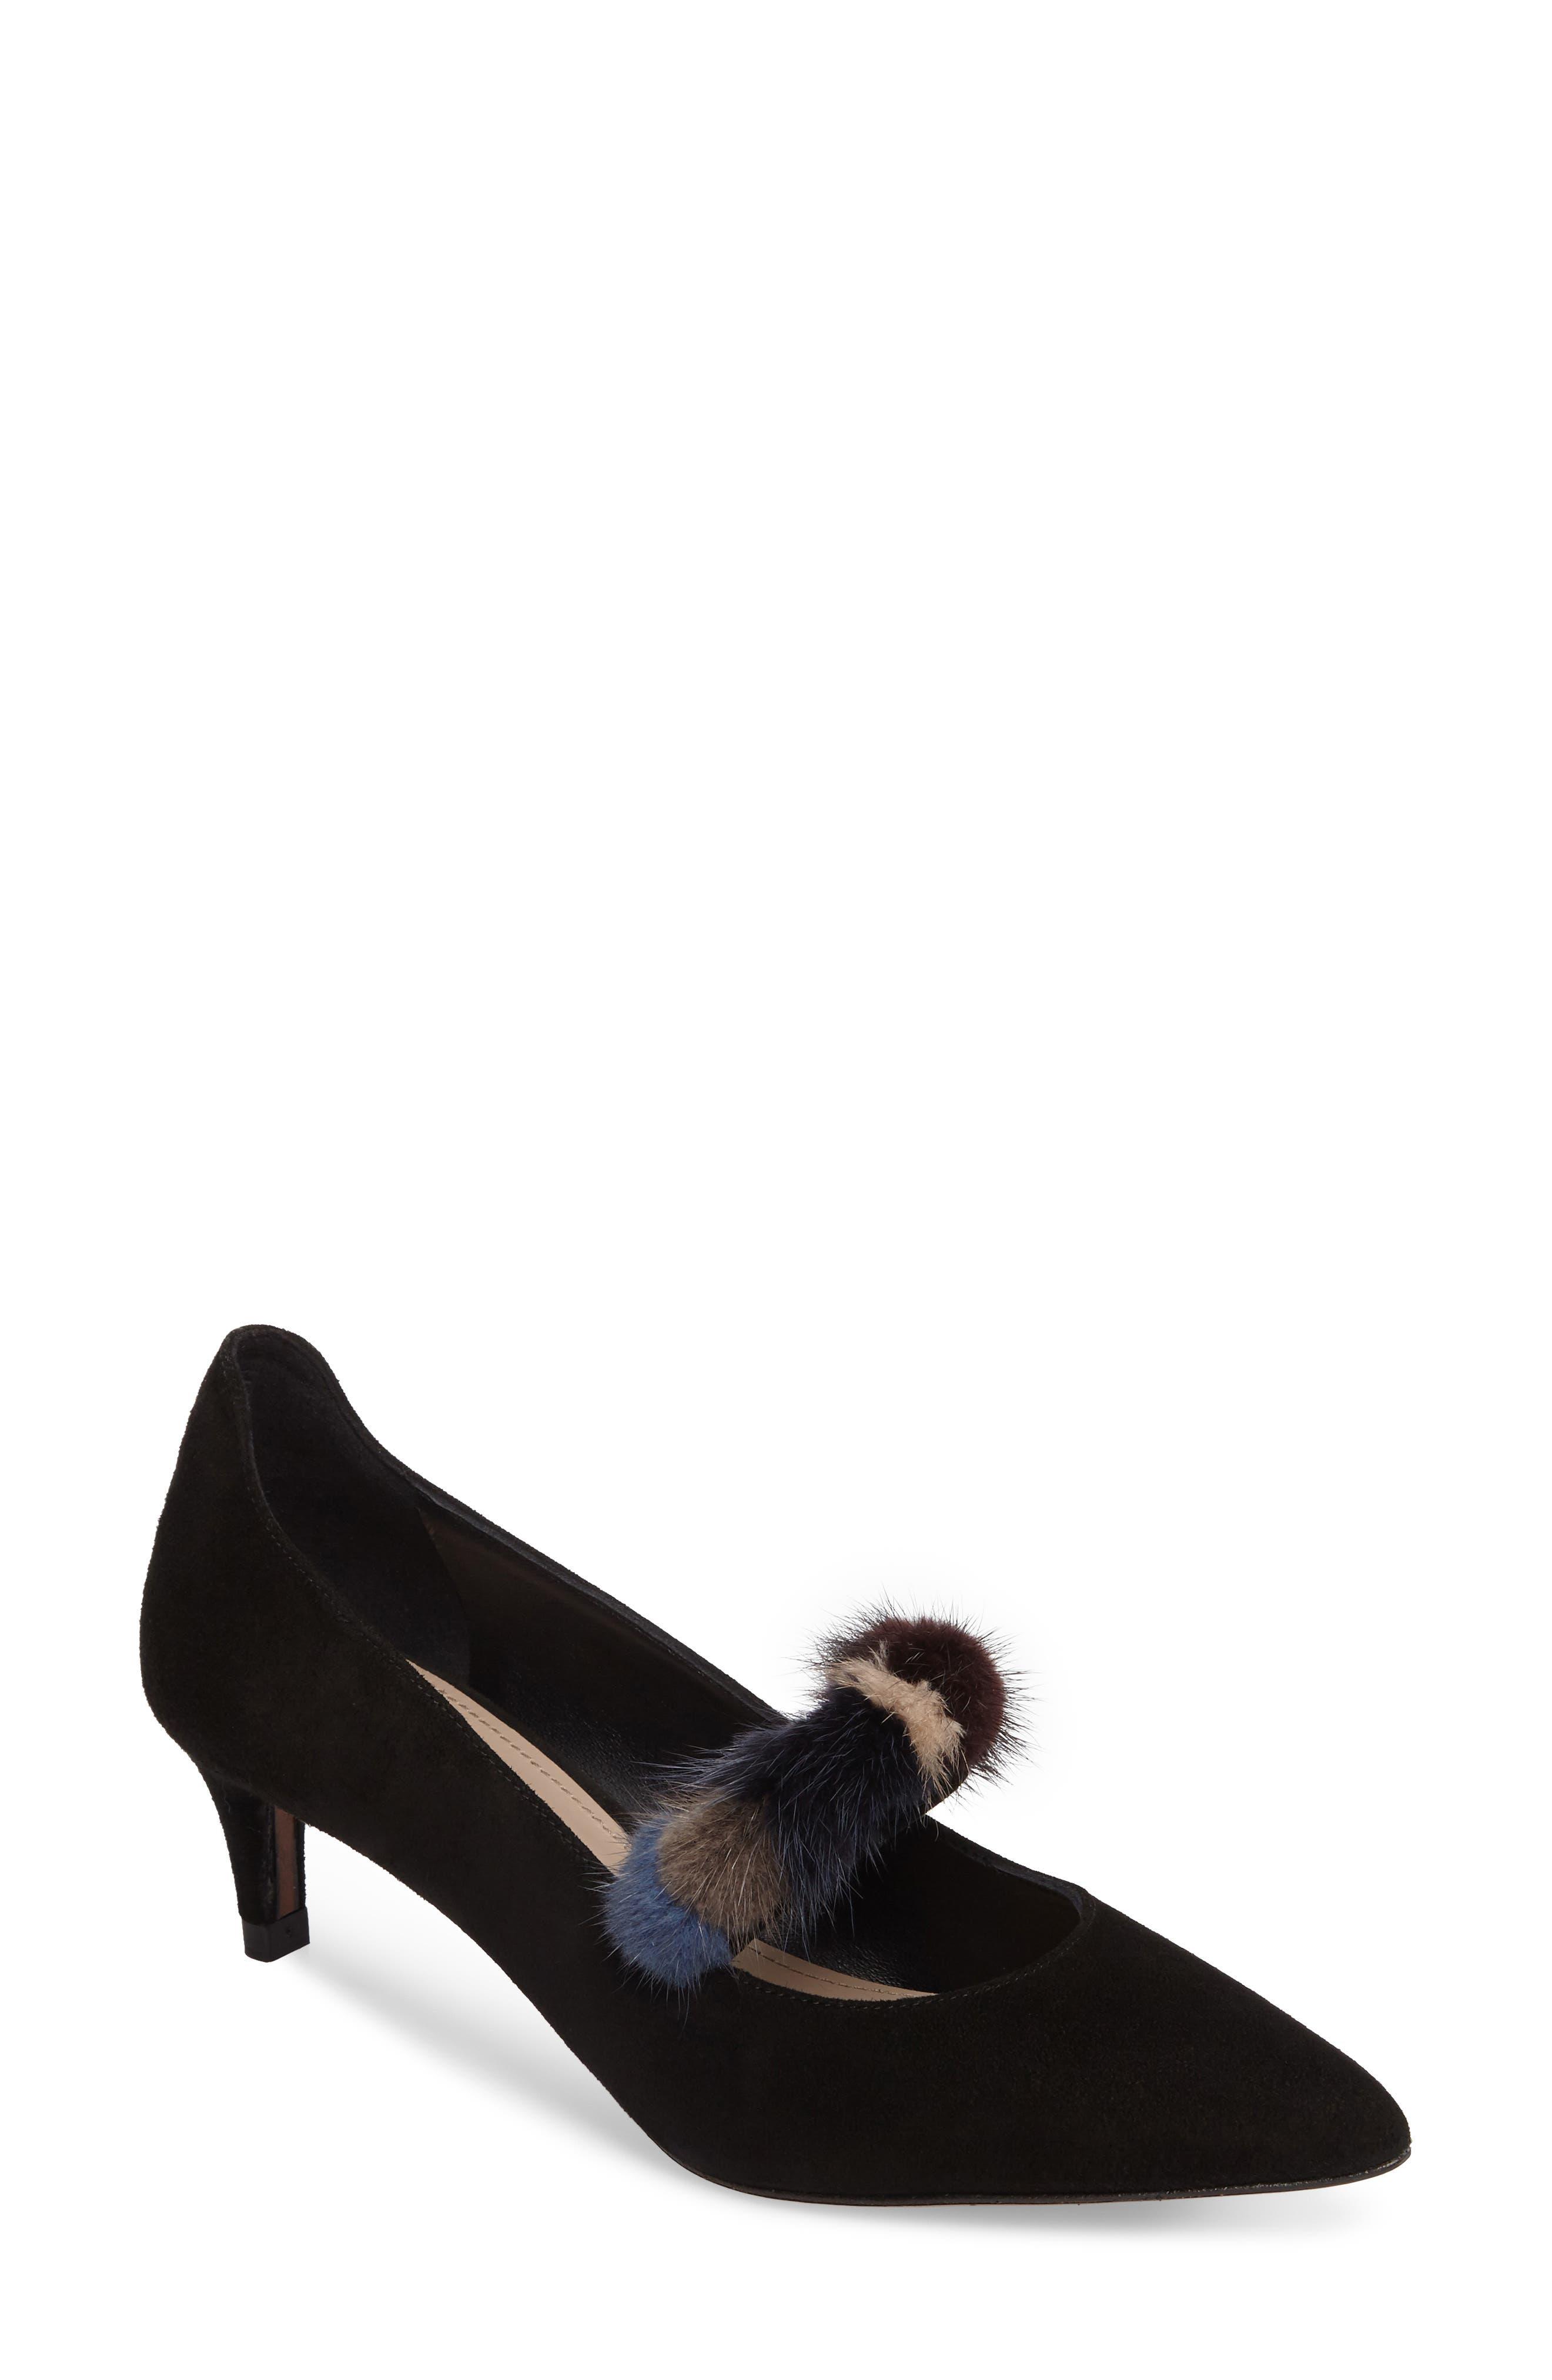 Main Image - Donald Pliner Blake Genuine Mink Fur Pump (Women)